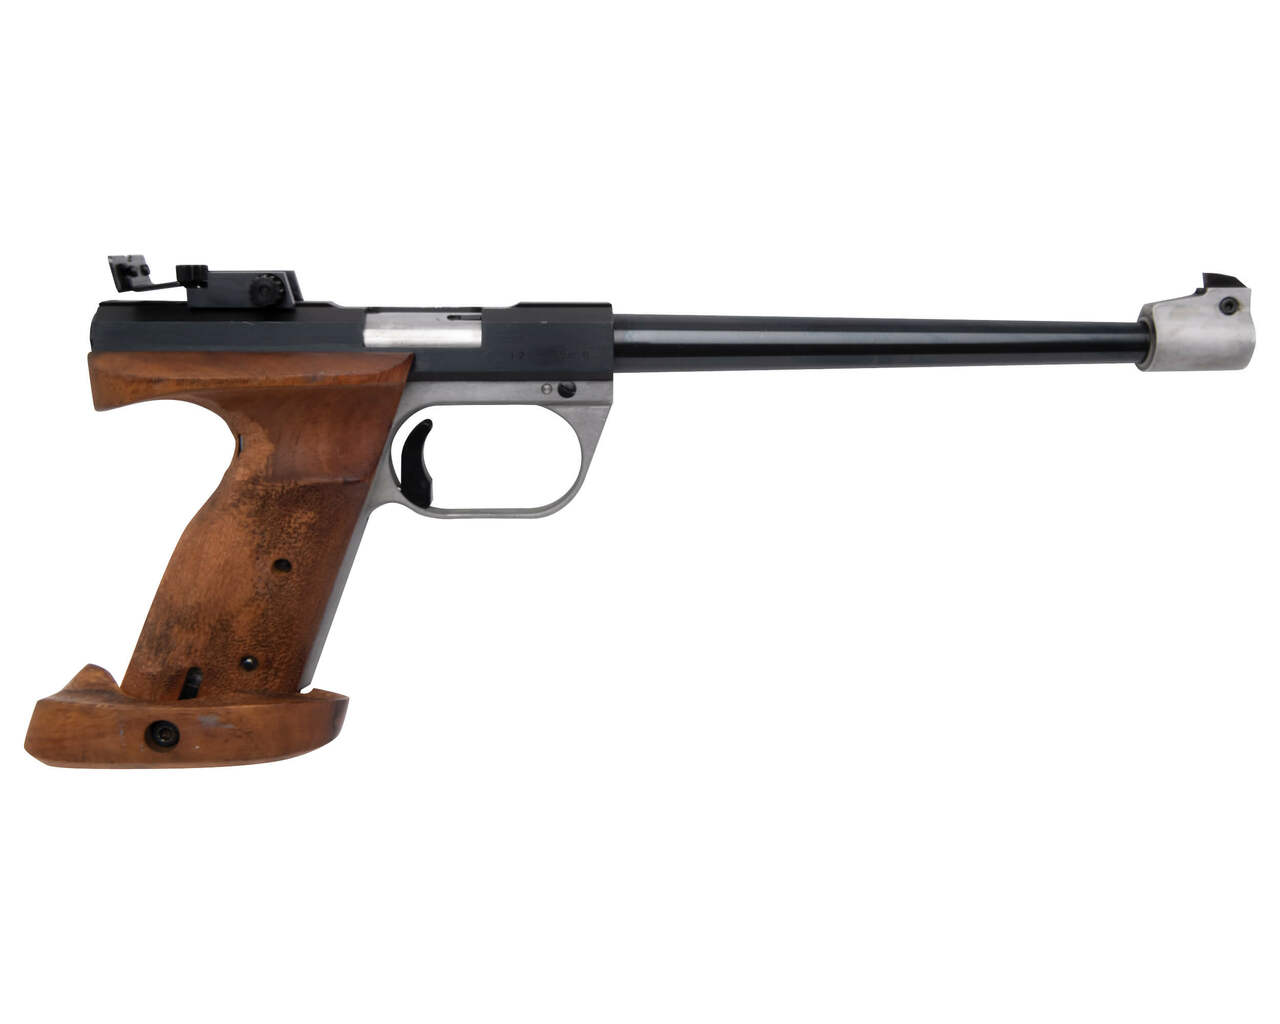 Hammerli 120 Sport Pistol - sn 12-2xxx